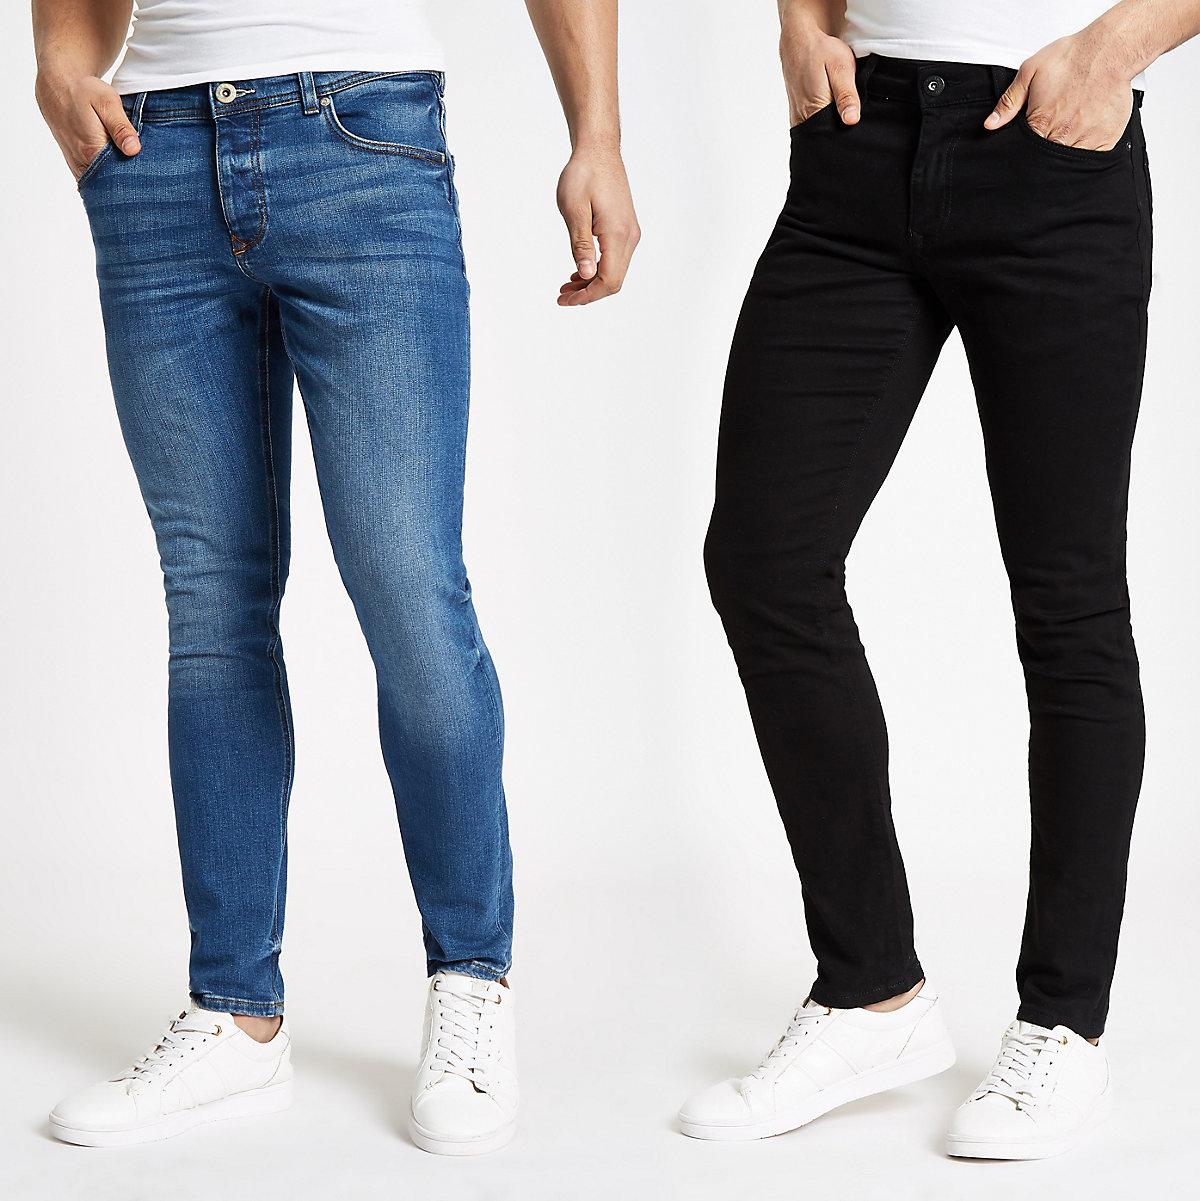 Sid – Skinny Fit Jeans in Schwarz und Blau, 2er-Pack